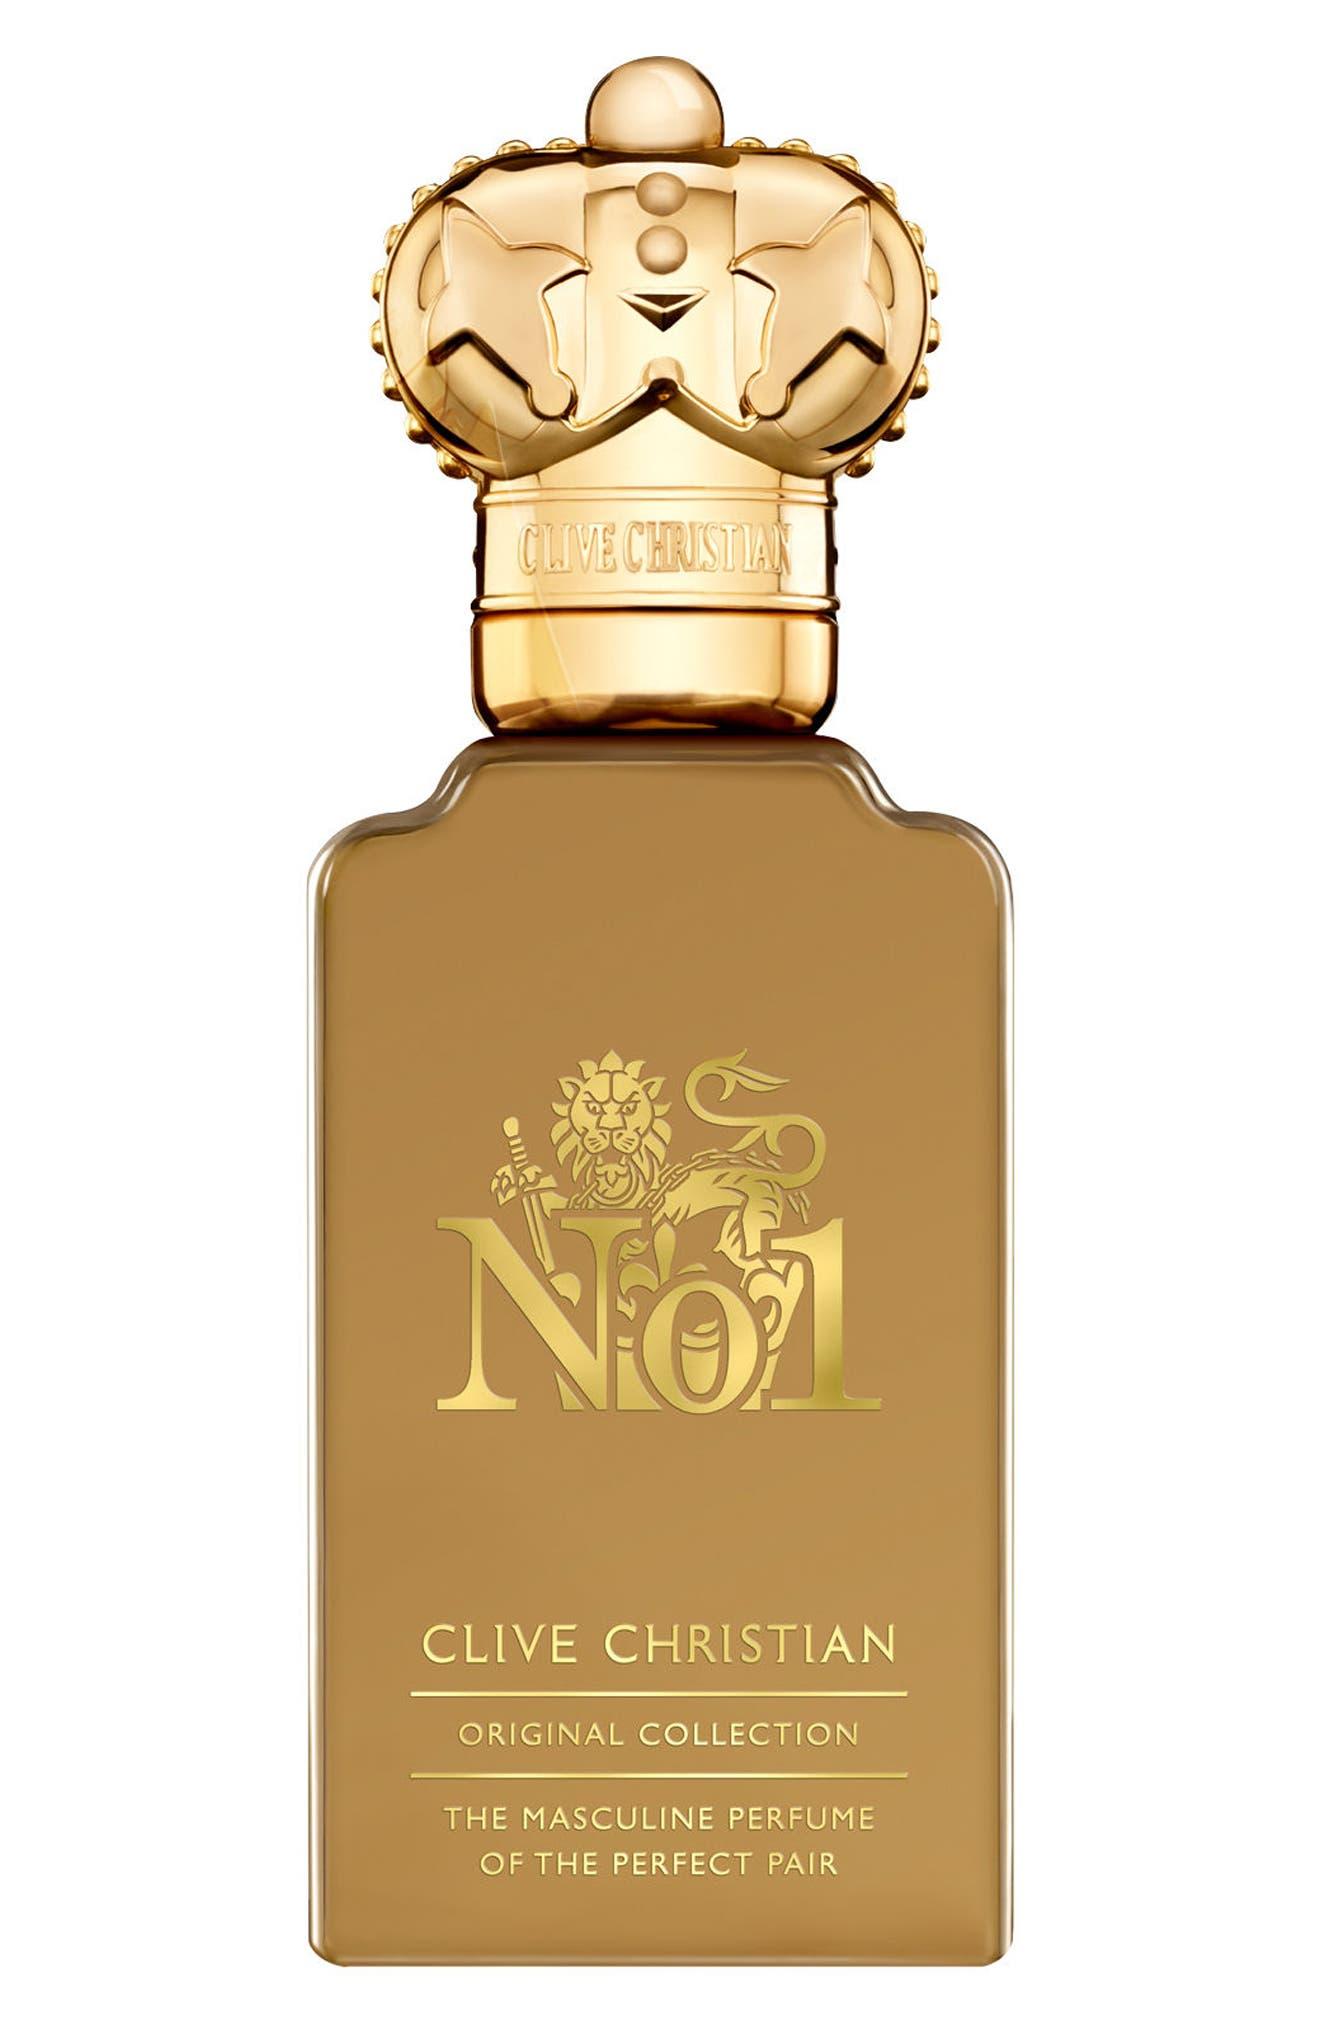 Clive Christian 'No. 1' Men's Pure Perfume Spray